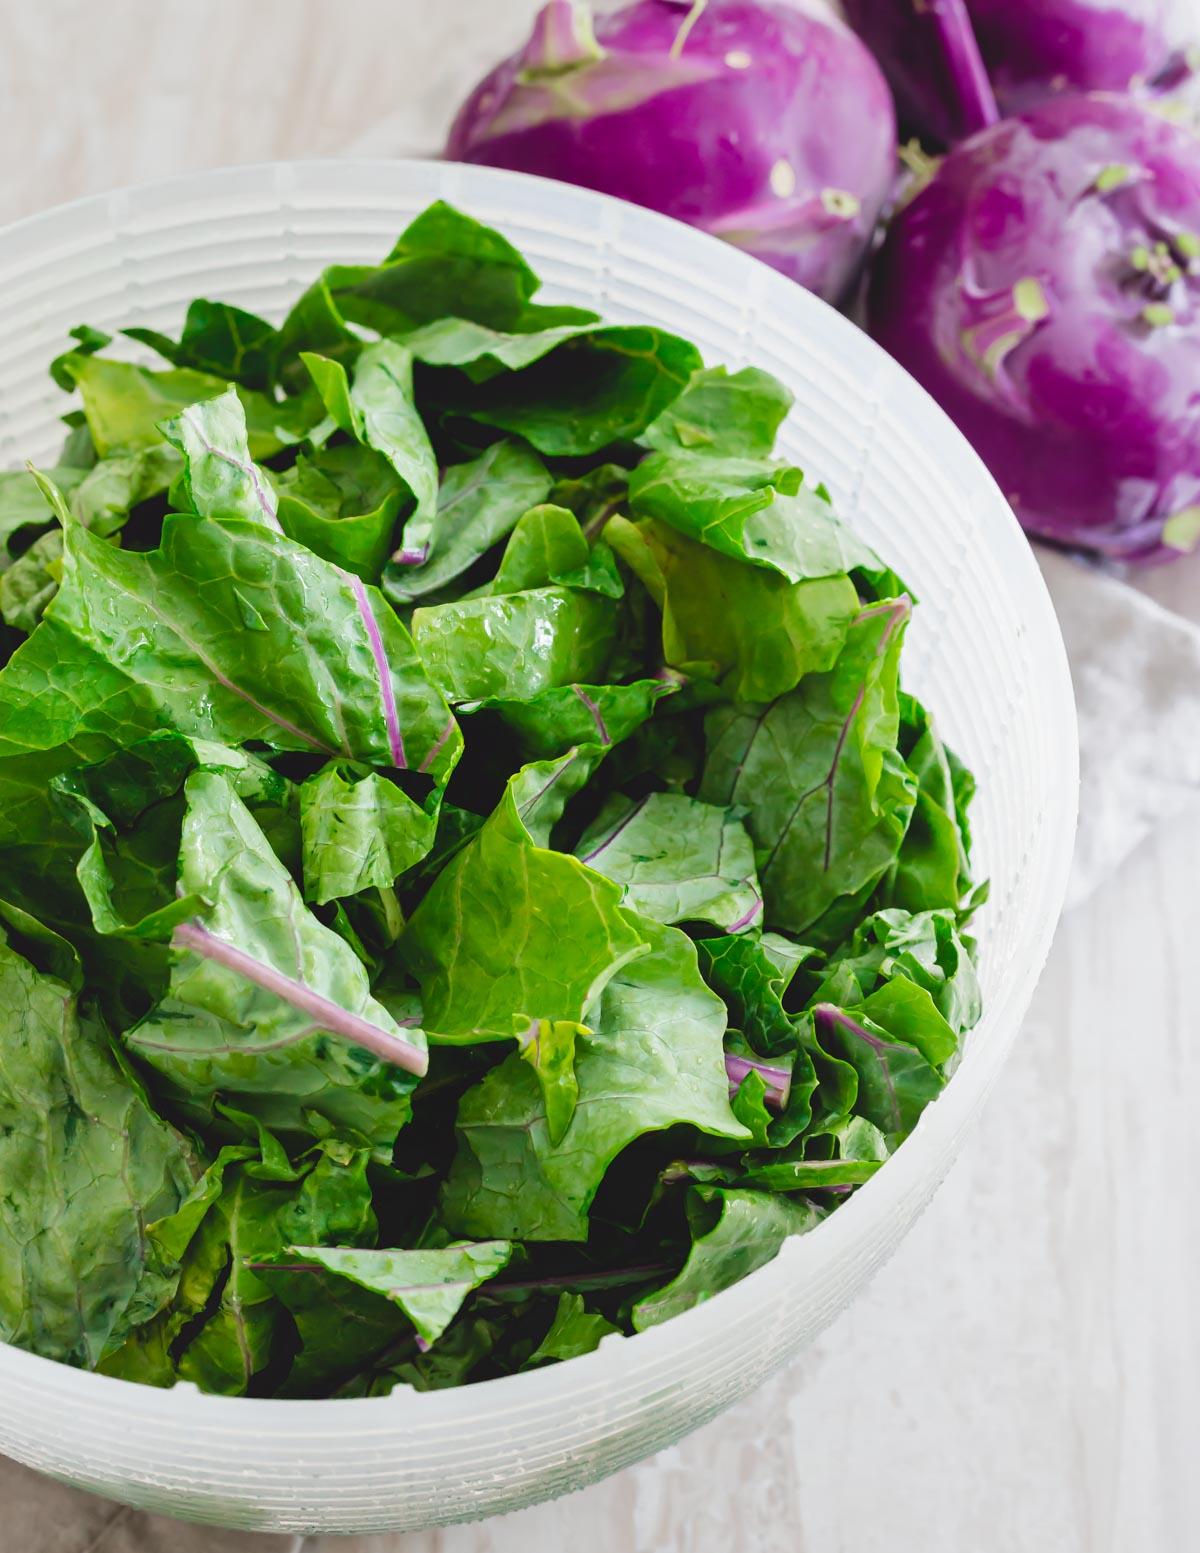 Washed and chopped kohlrabi greens.